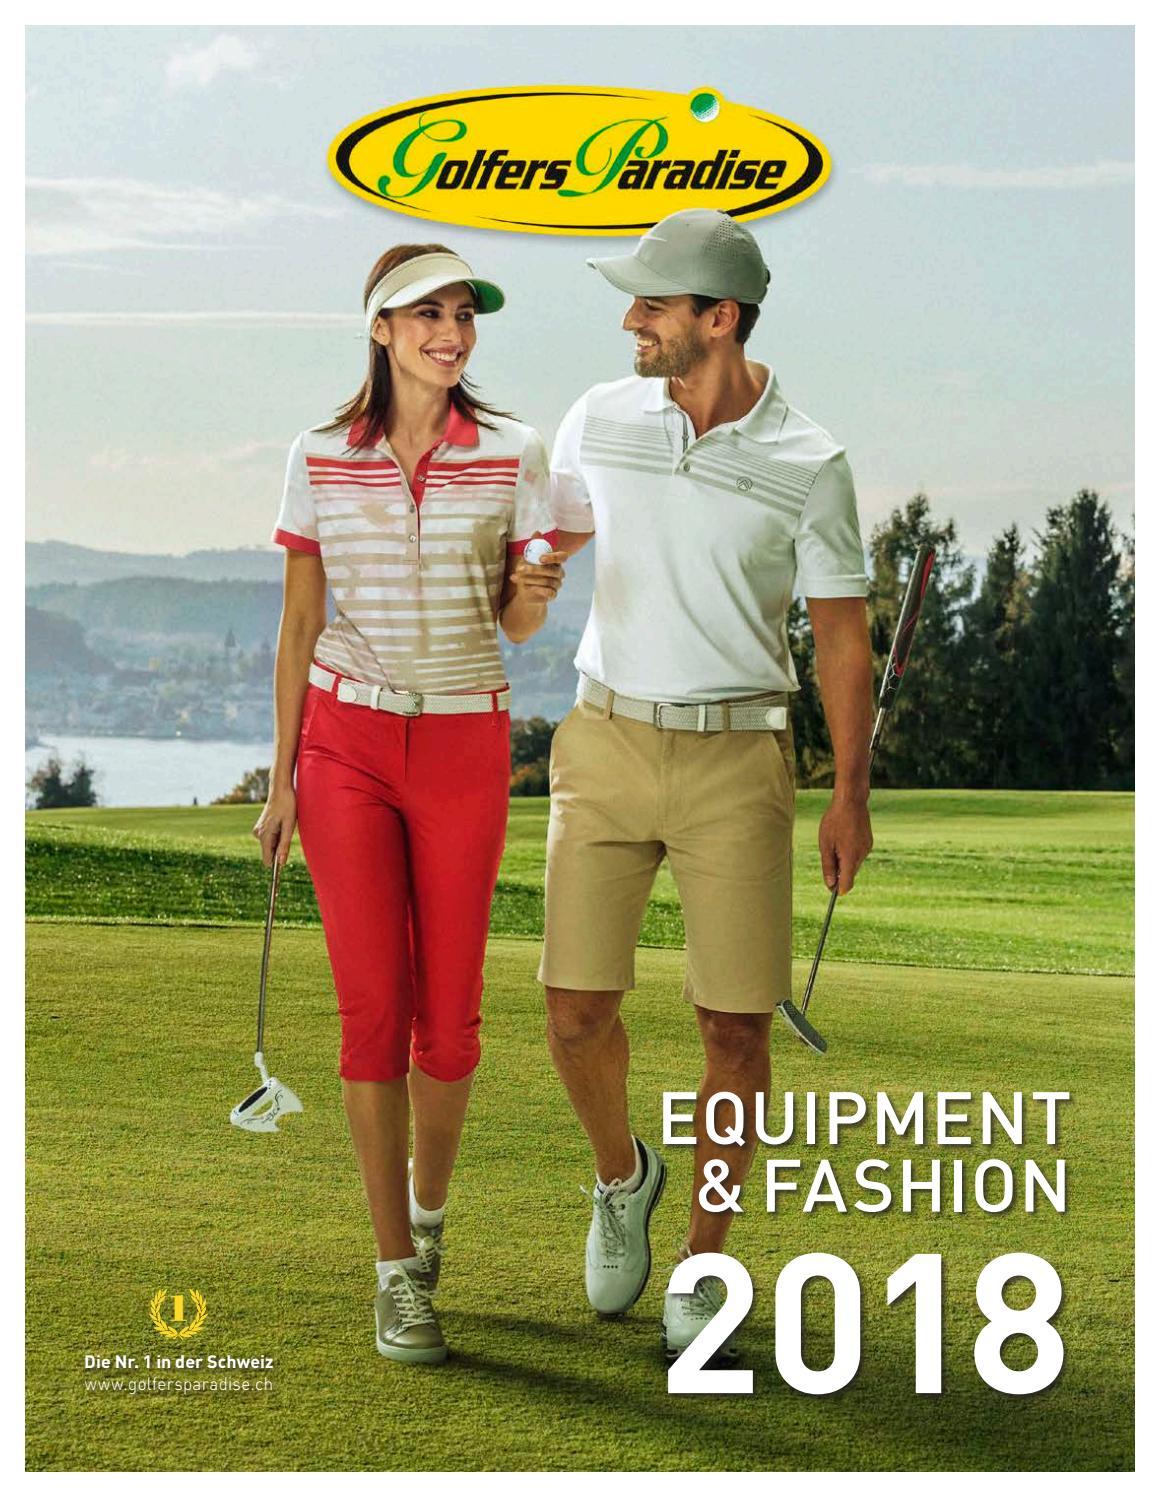 Golfers Paradise Katalog 2018 by Nicole issuu